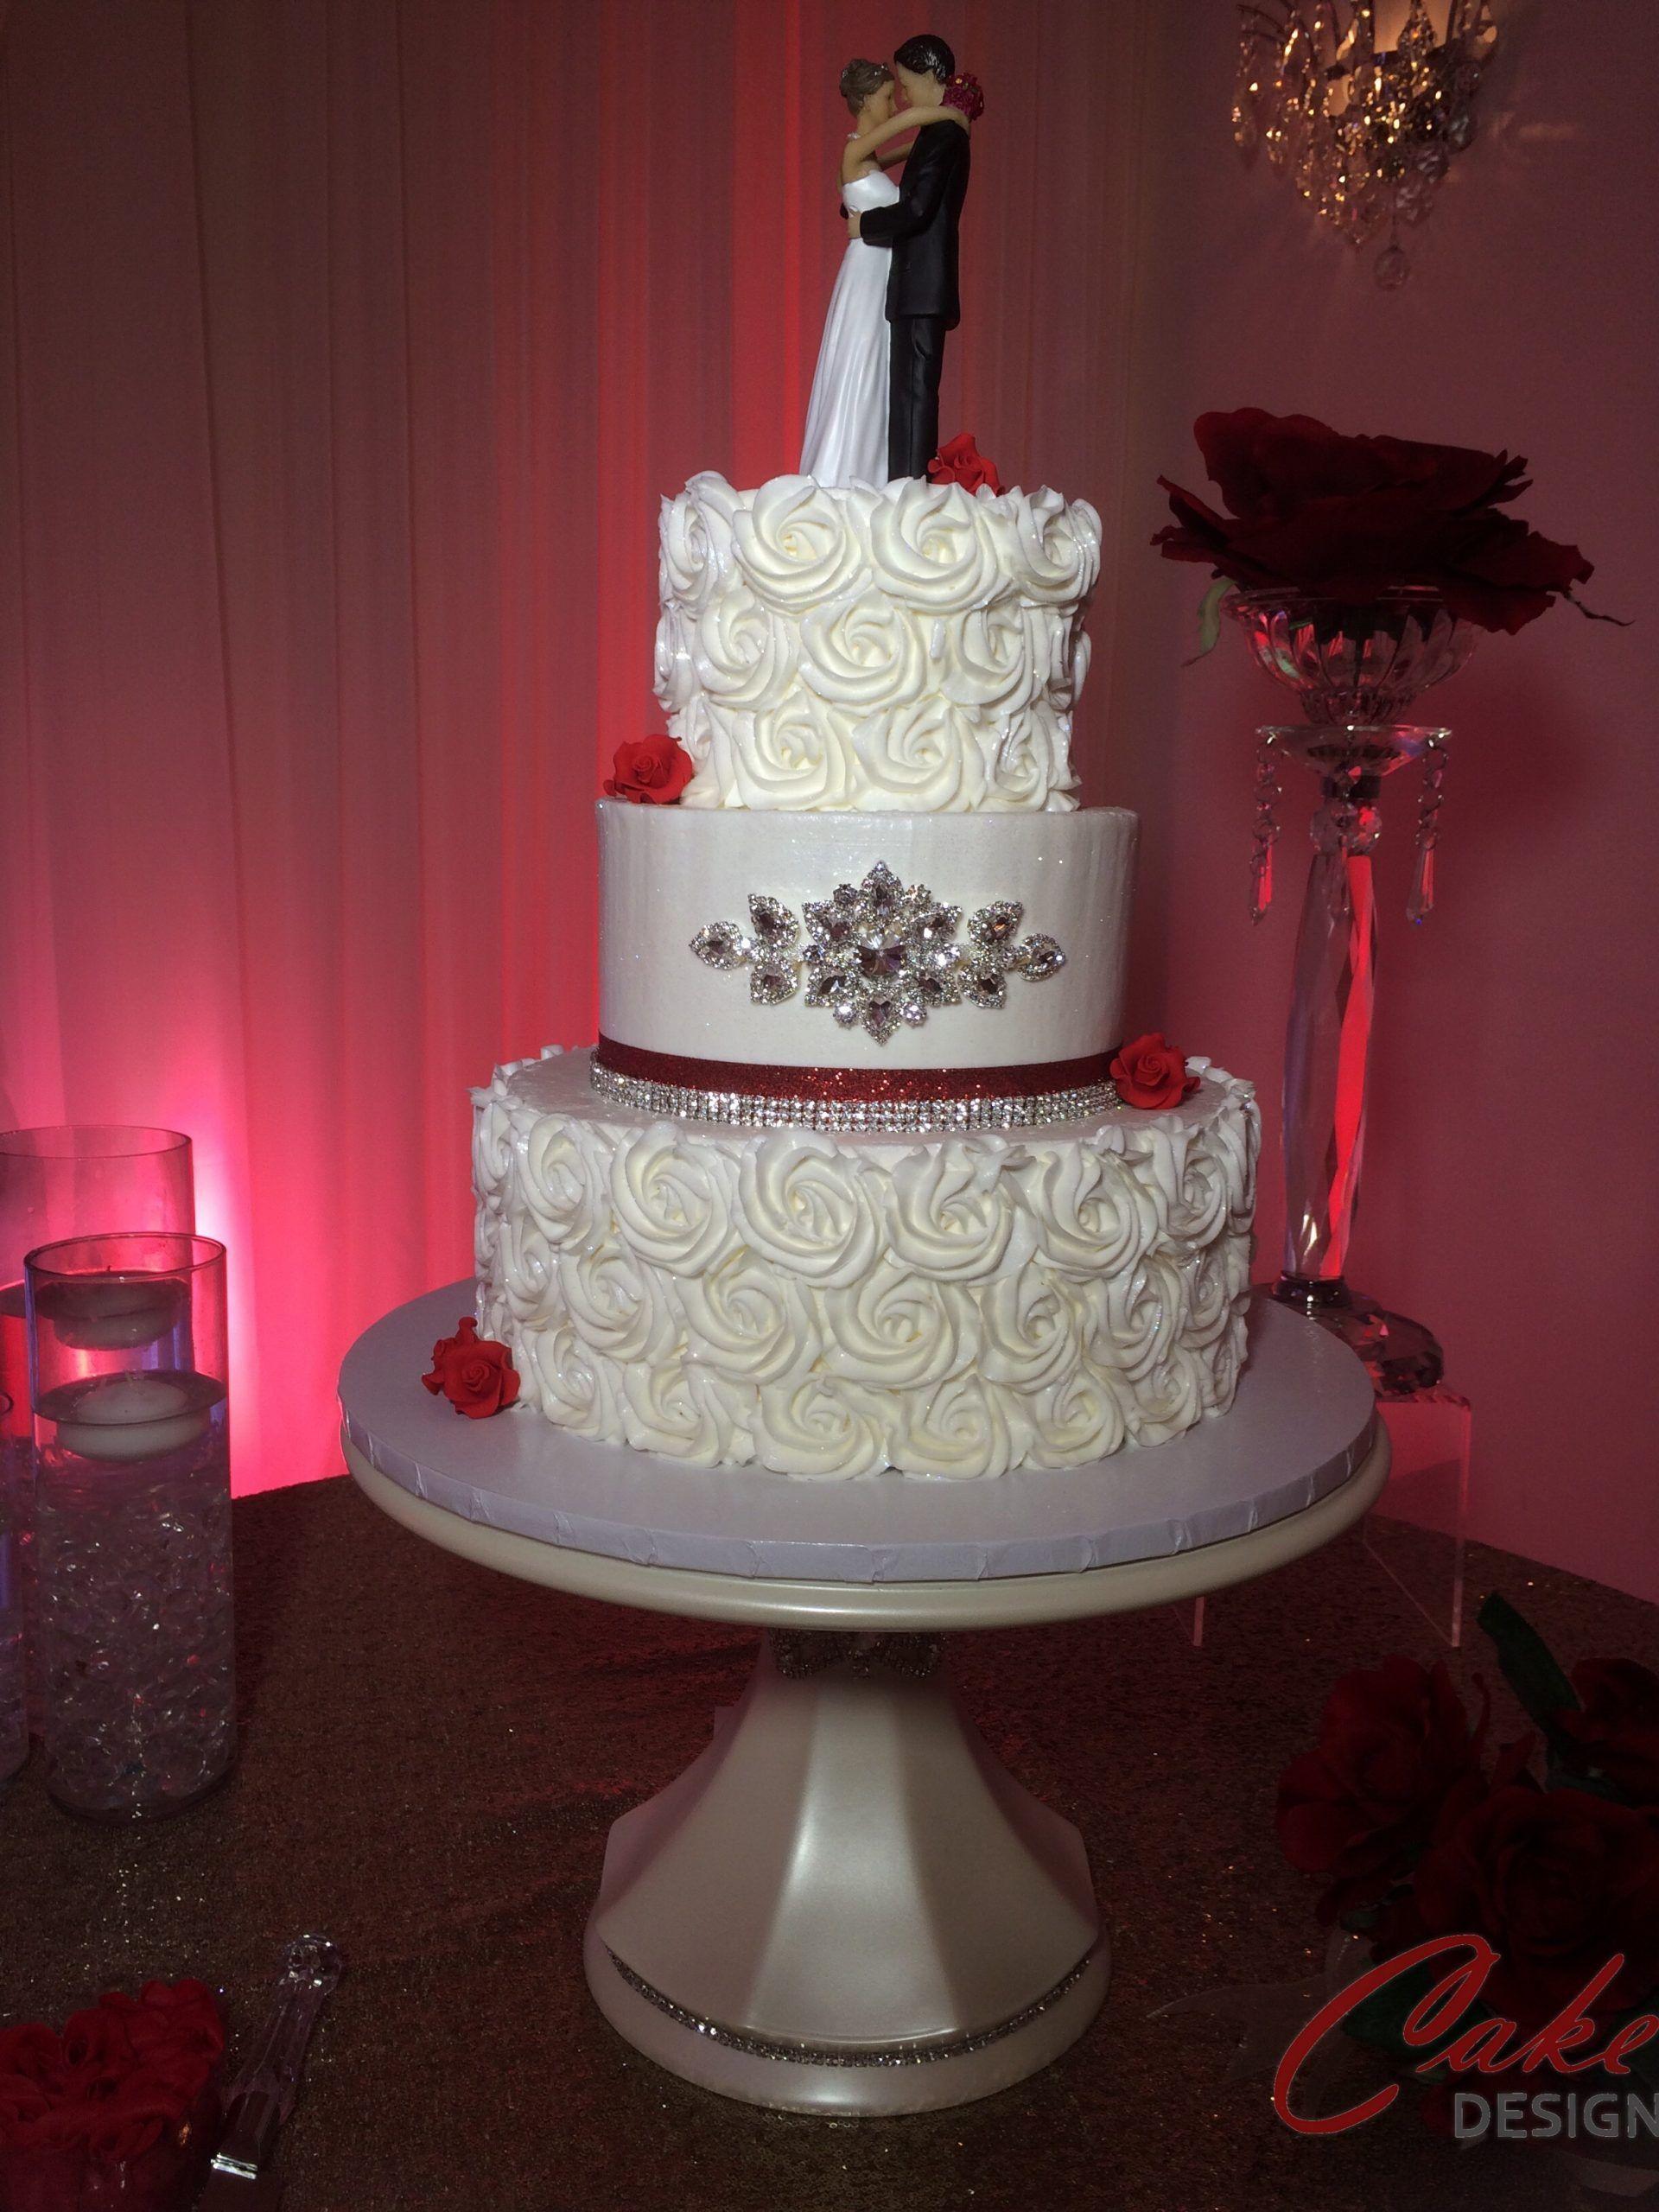 Wedding Cake Bakery Near Me For Wedding Ideas Wedding Ideas Makeit Bakery Cake Ideas Makeit Weddi Wedding Cake Bakery Diy Wedding Cake Wedding Cake Maker